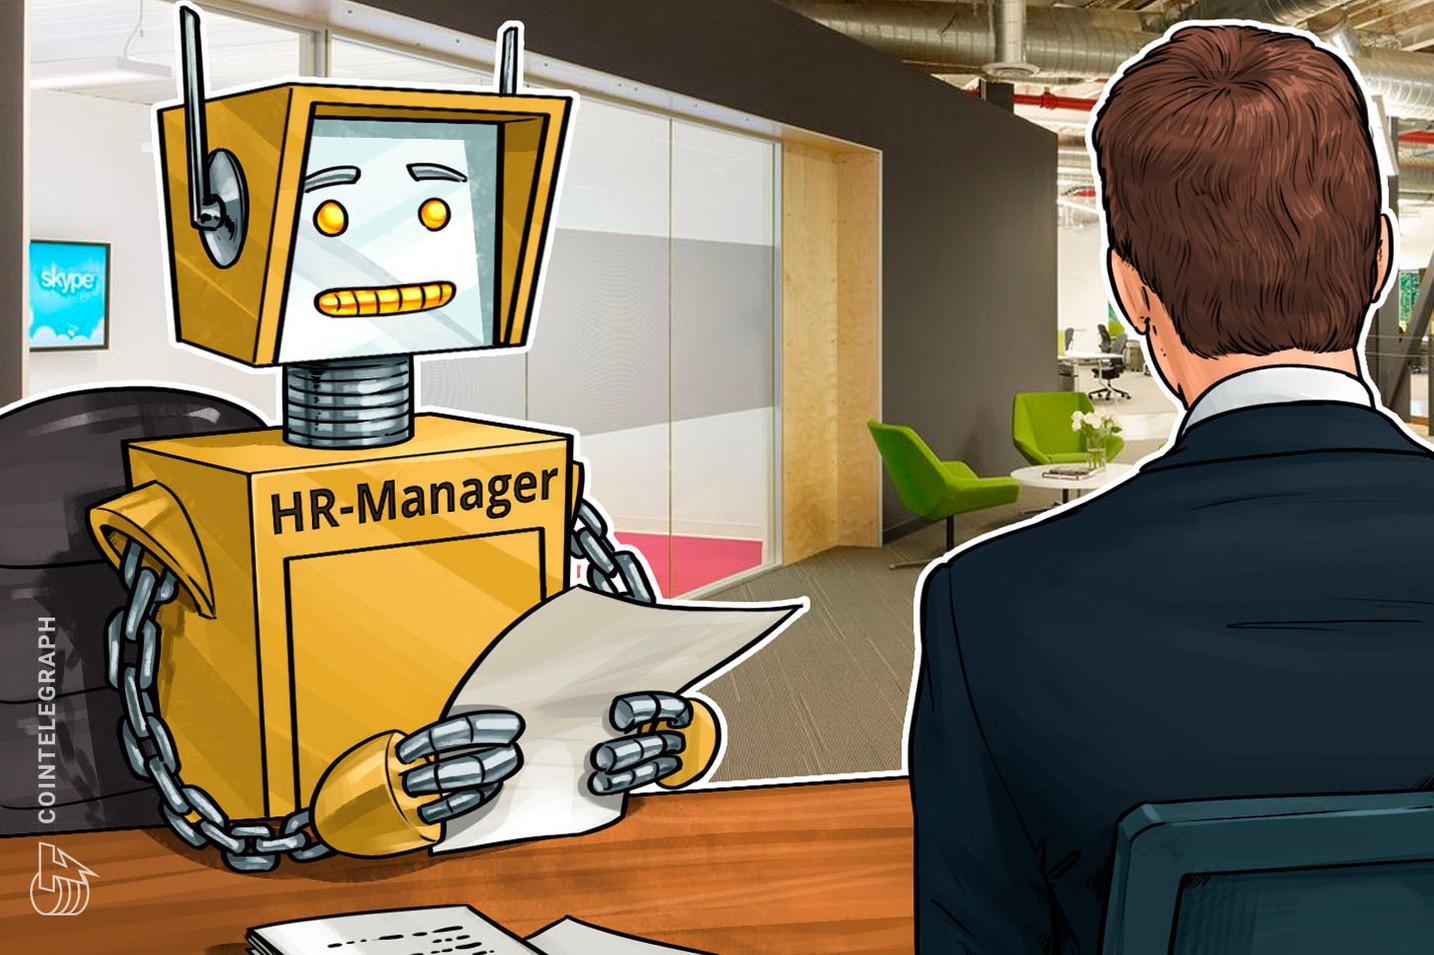 Seoul City Gov't Appoints Members to Blockchain Governance Team